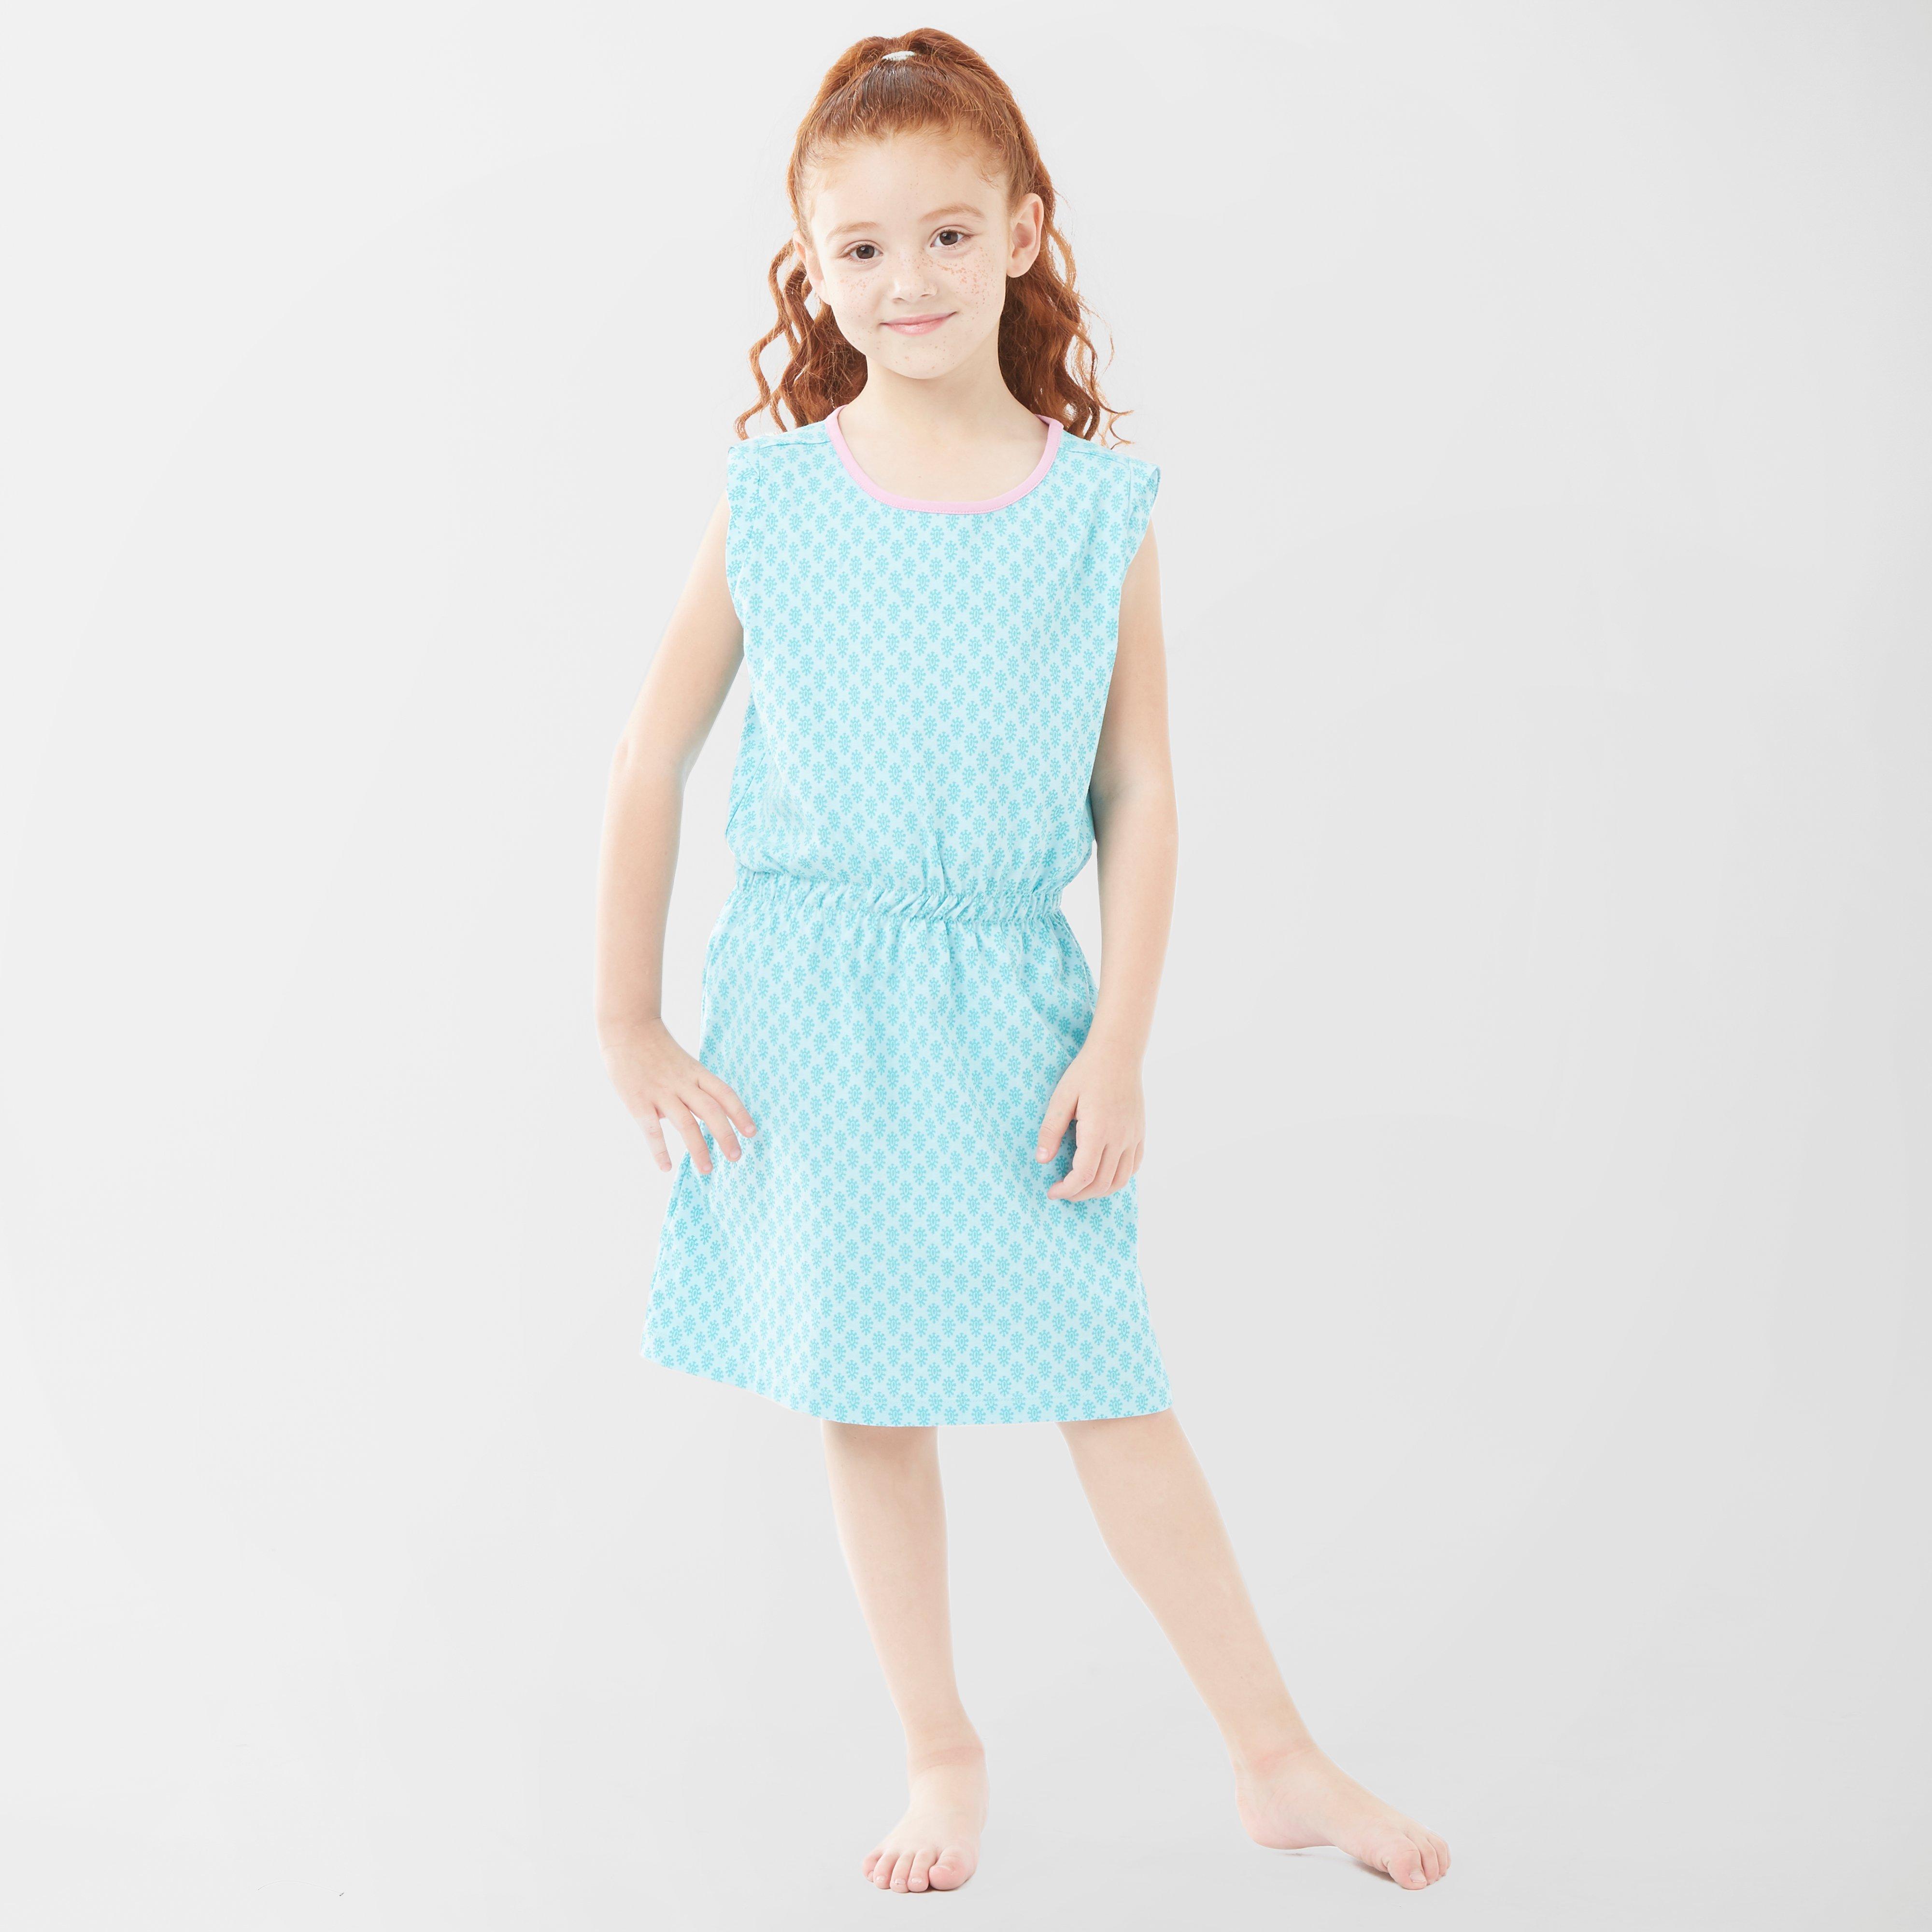 Jack Wolfskin Kids Lily Lagoon Dress, Blue